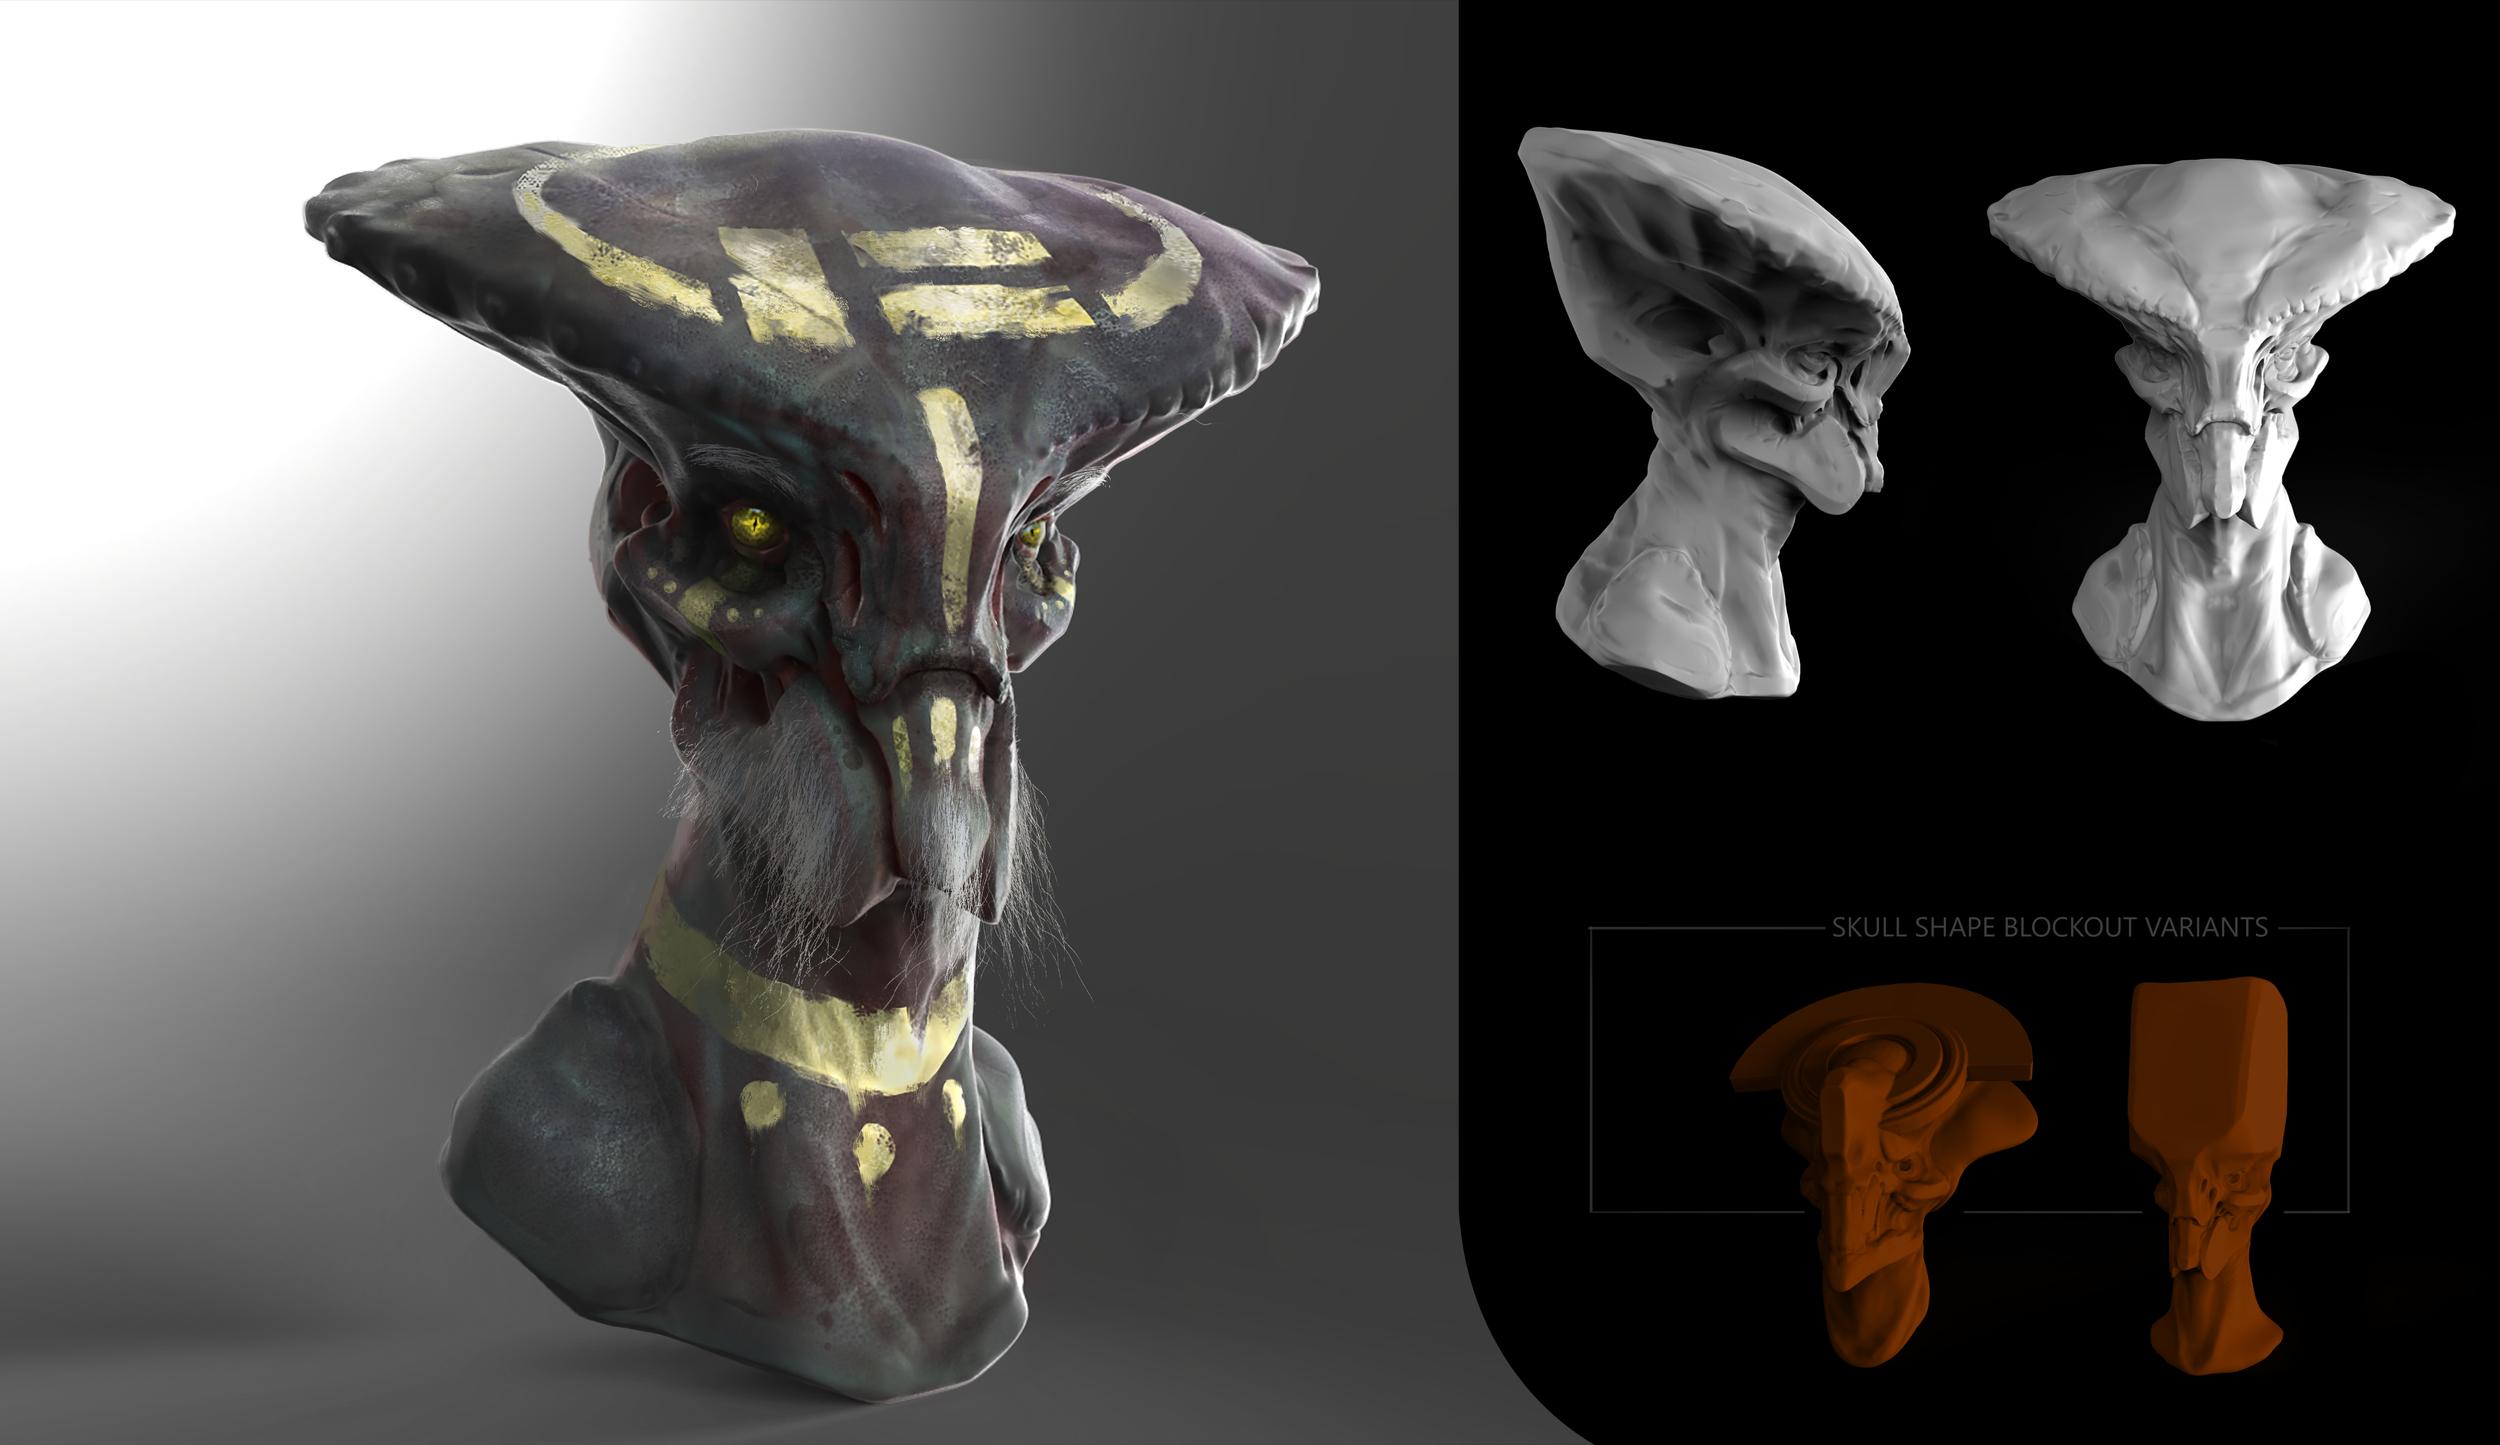 10_alien_bust.85.jpg